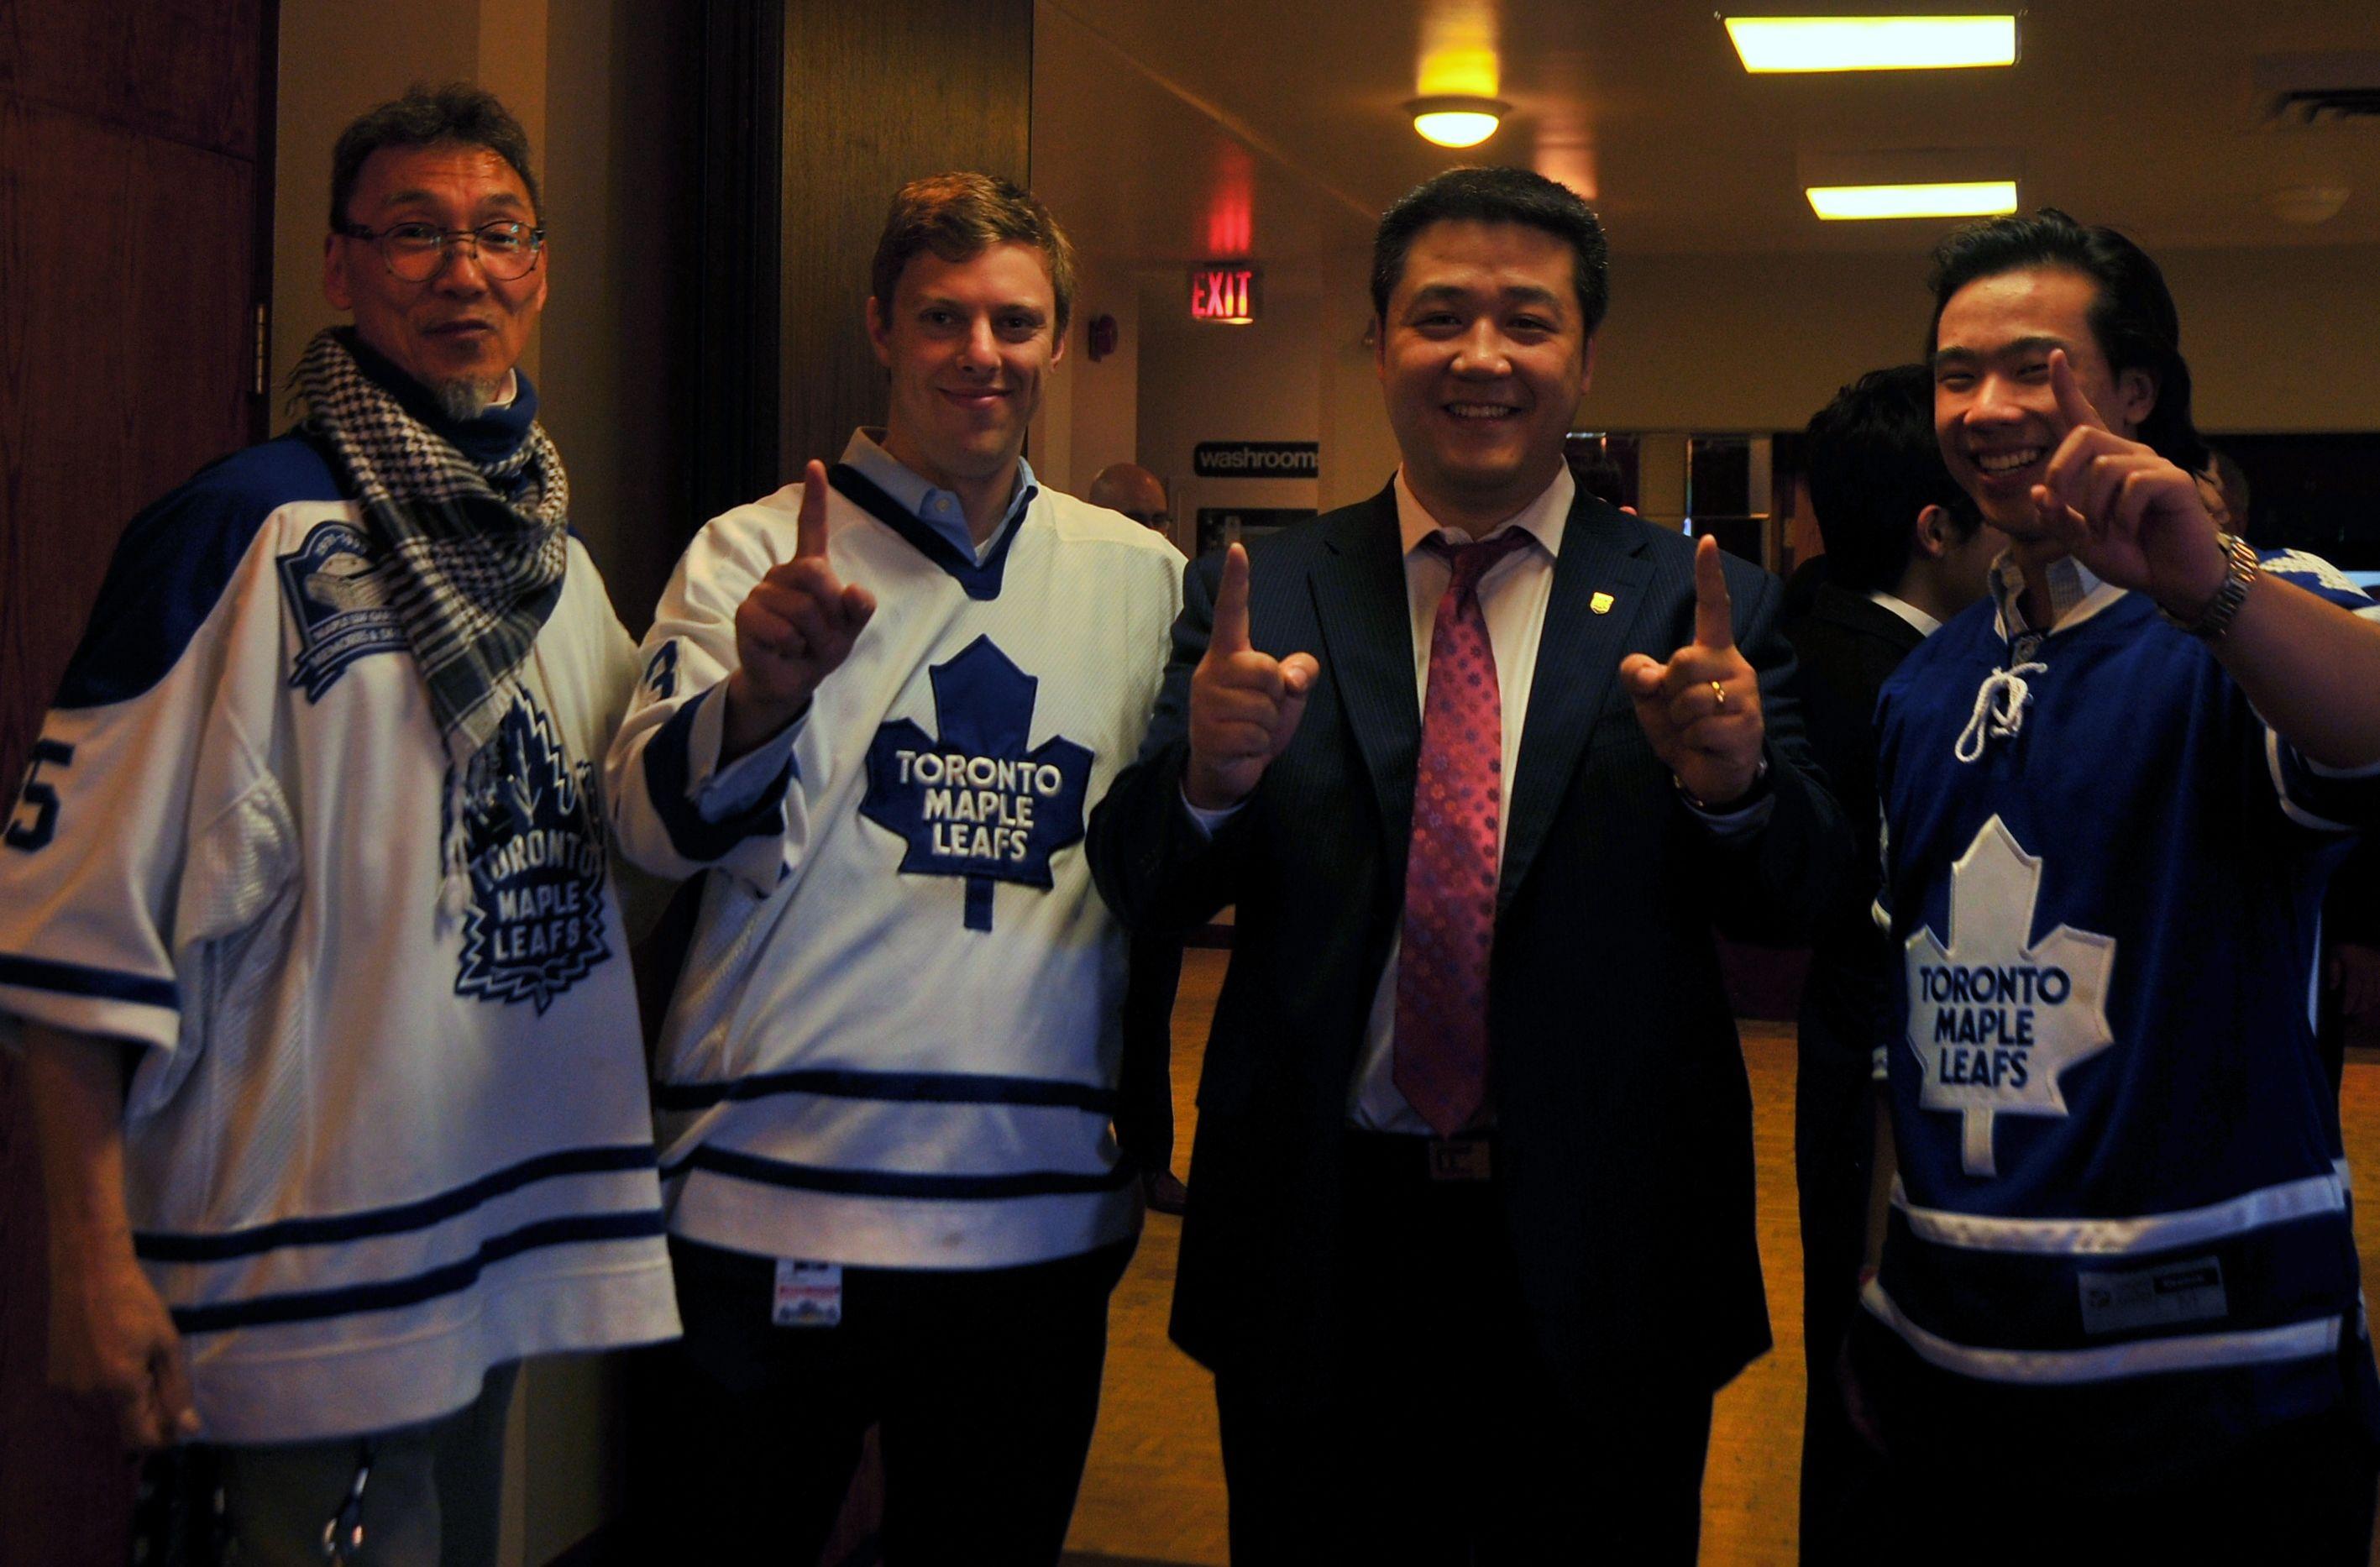 Han Dong trinityspadina provincial riding nominee just